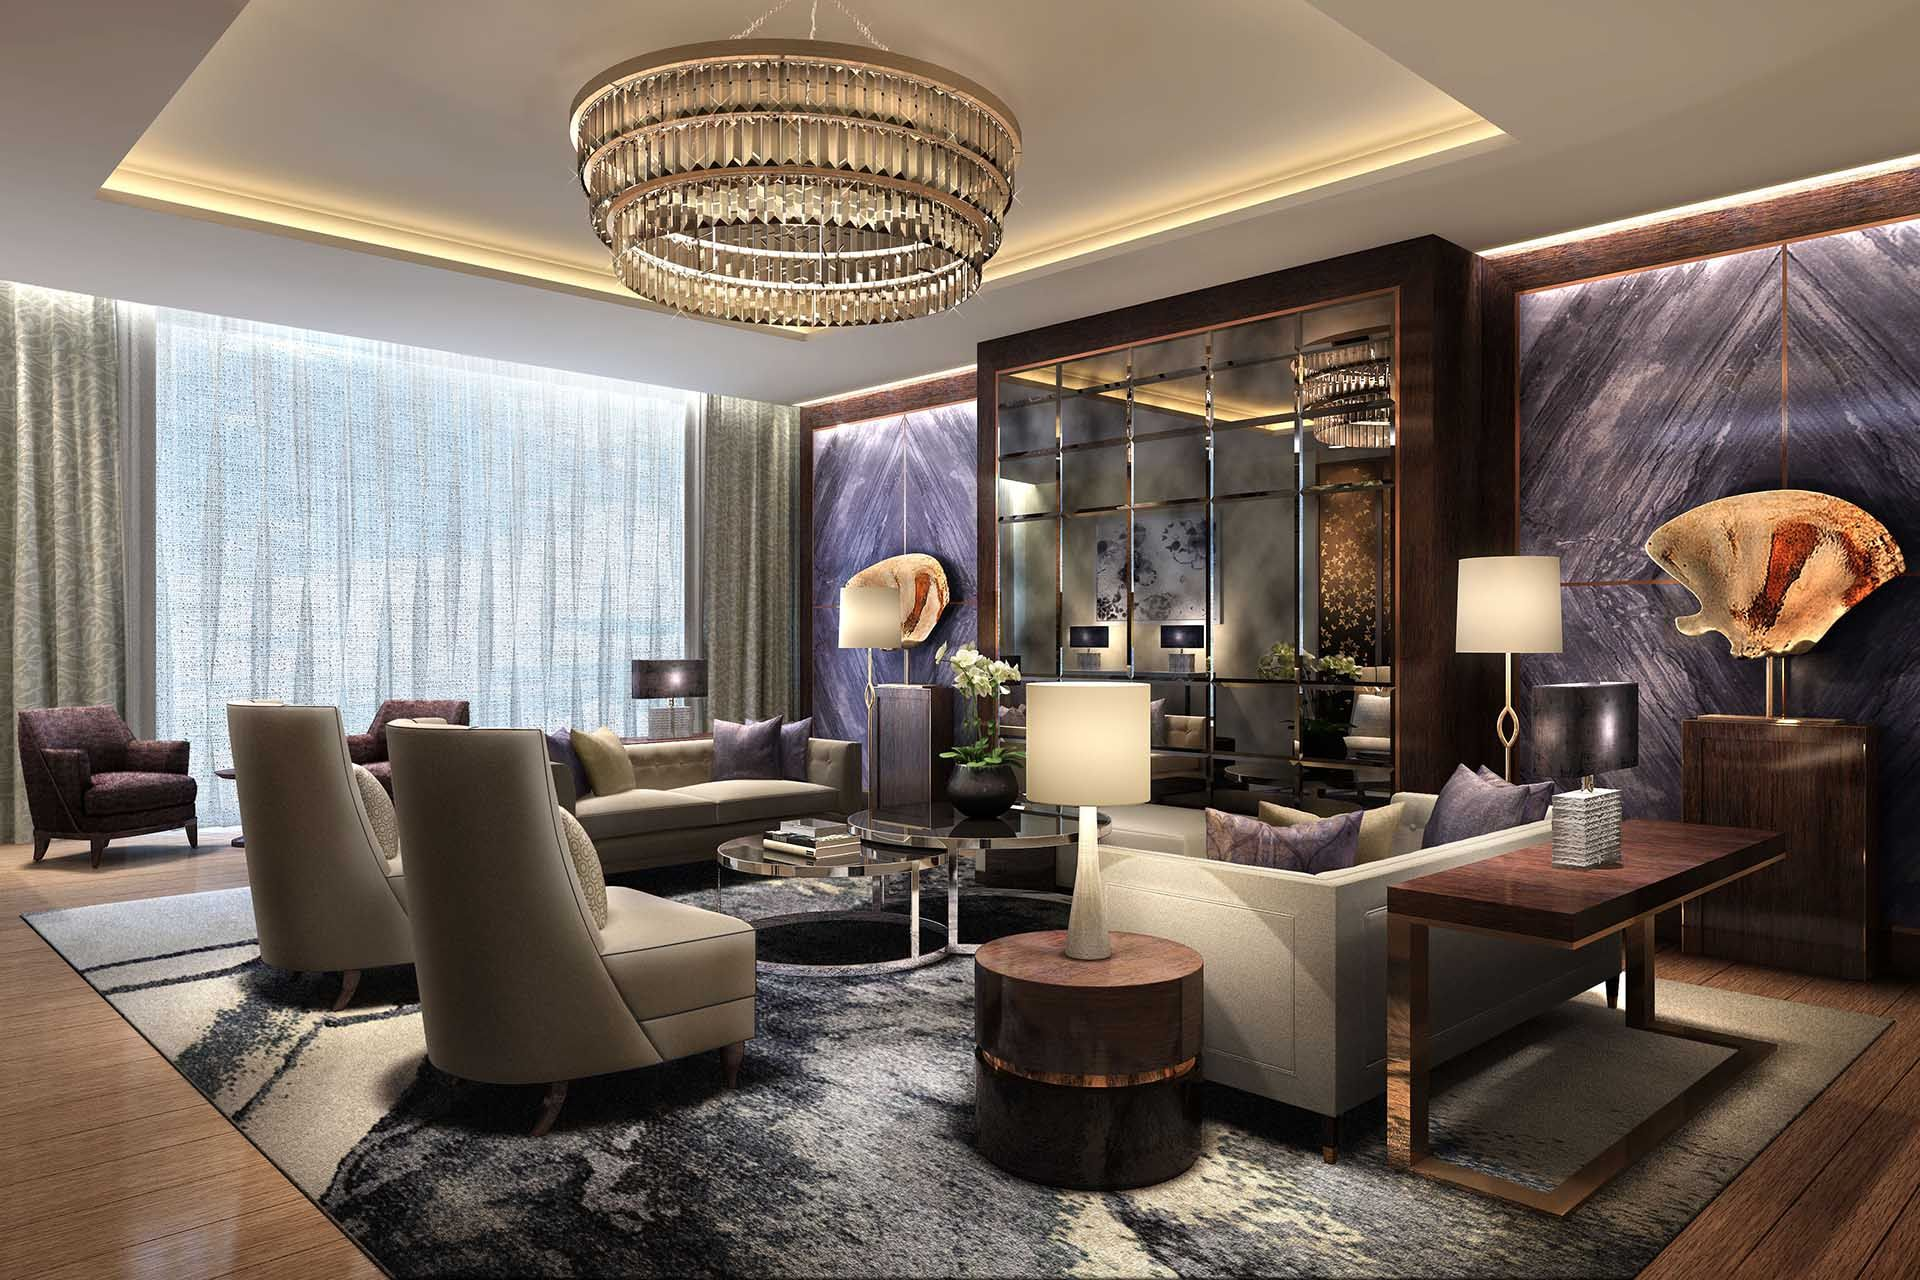 Jw marriott muscat interior designers wimberly interiors for Luxury residential interior designers london